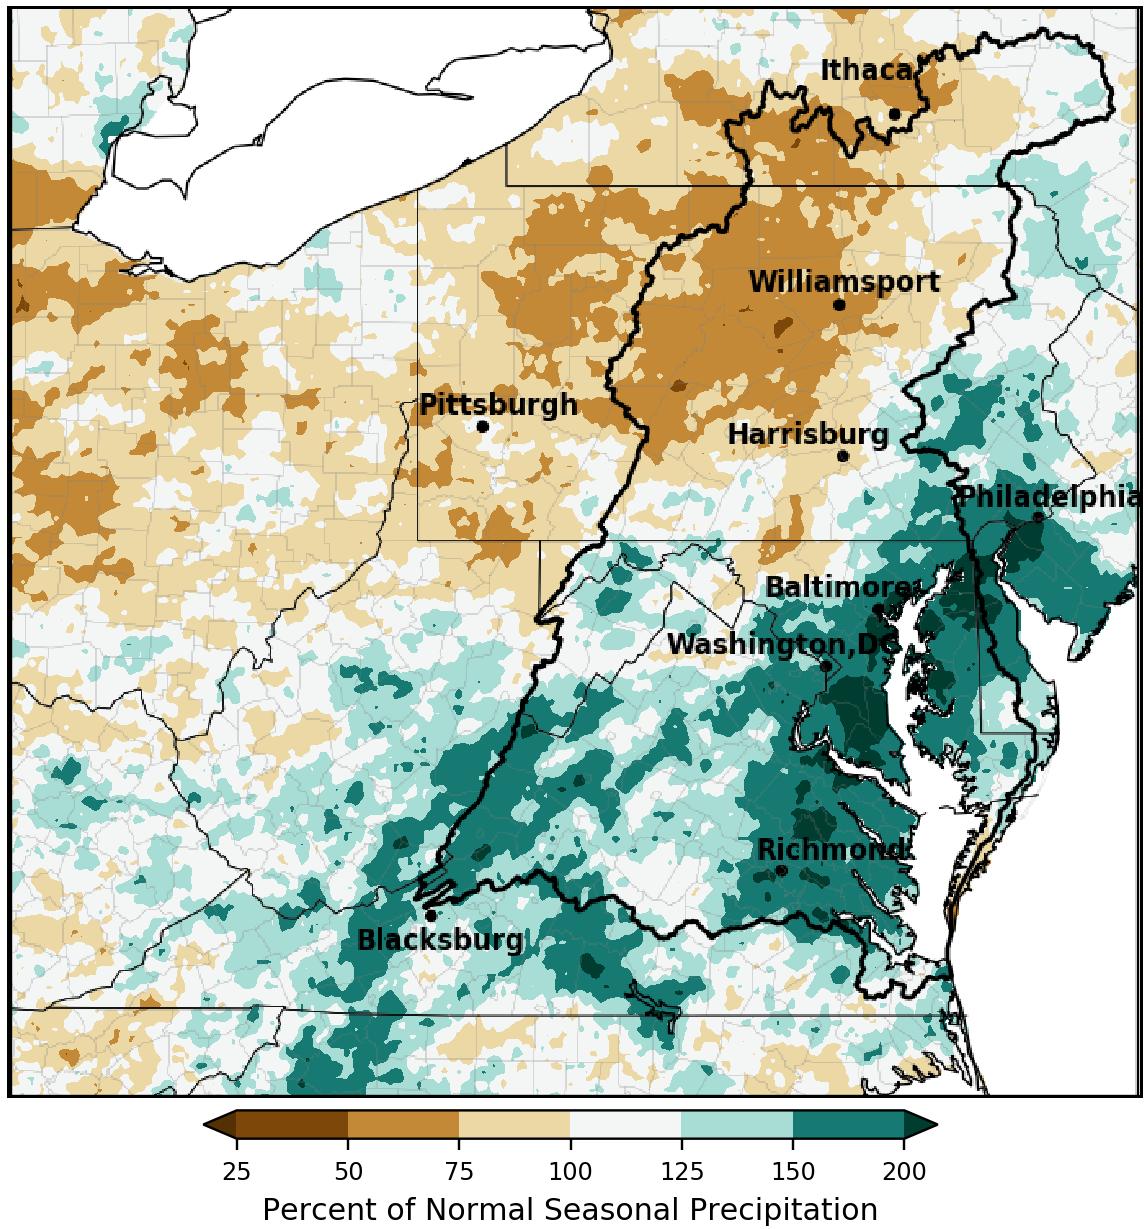 Precipitation map for the Chesapeake Bay region for Summer 2020